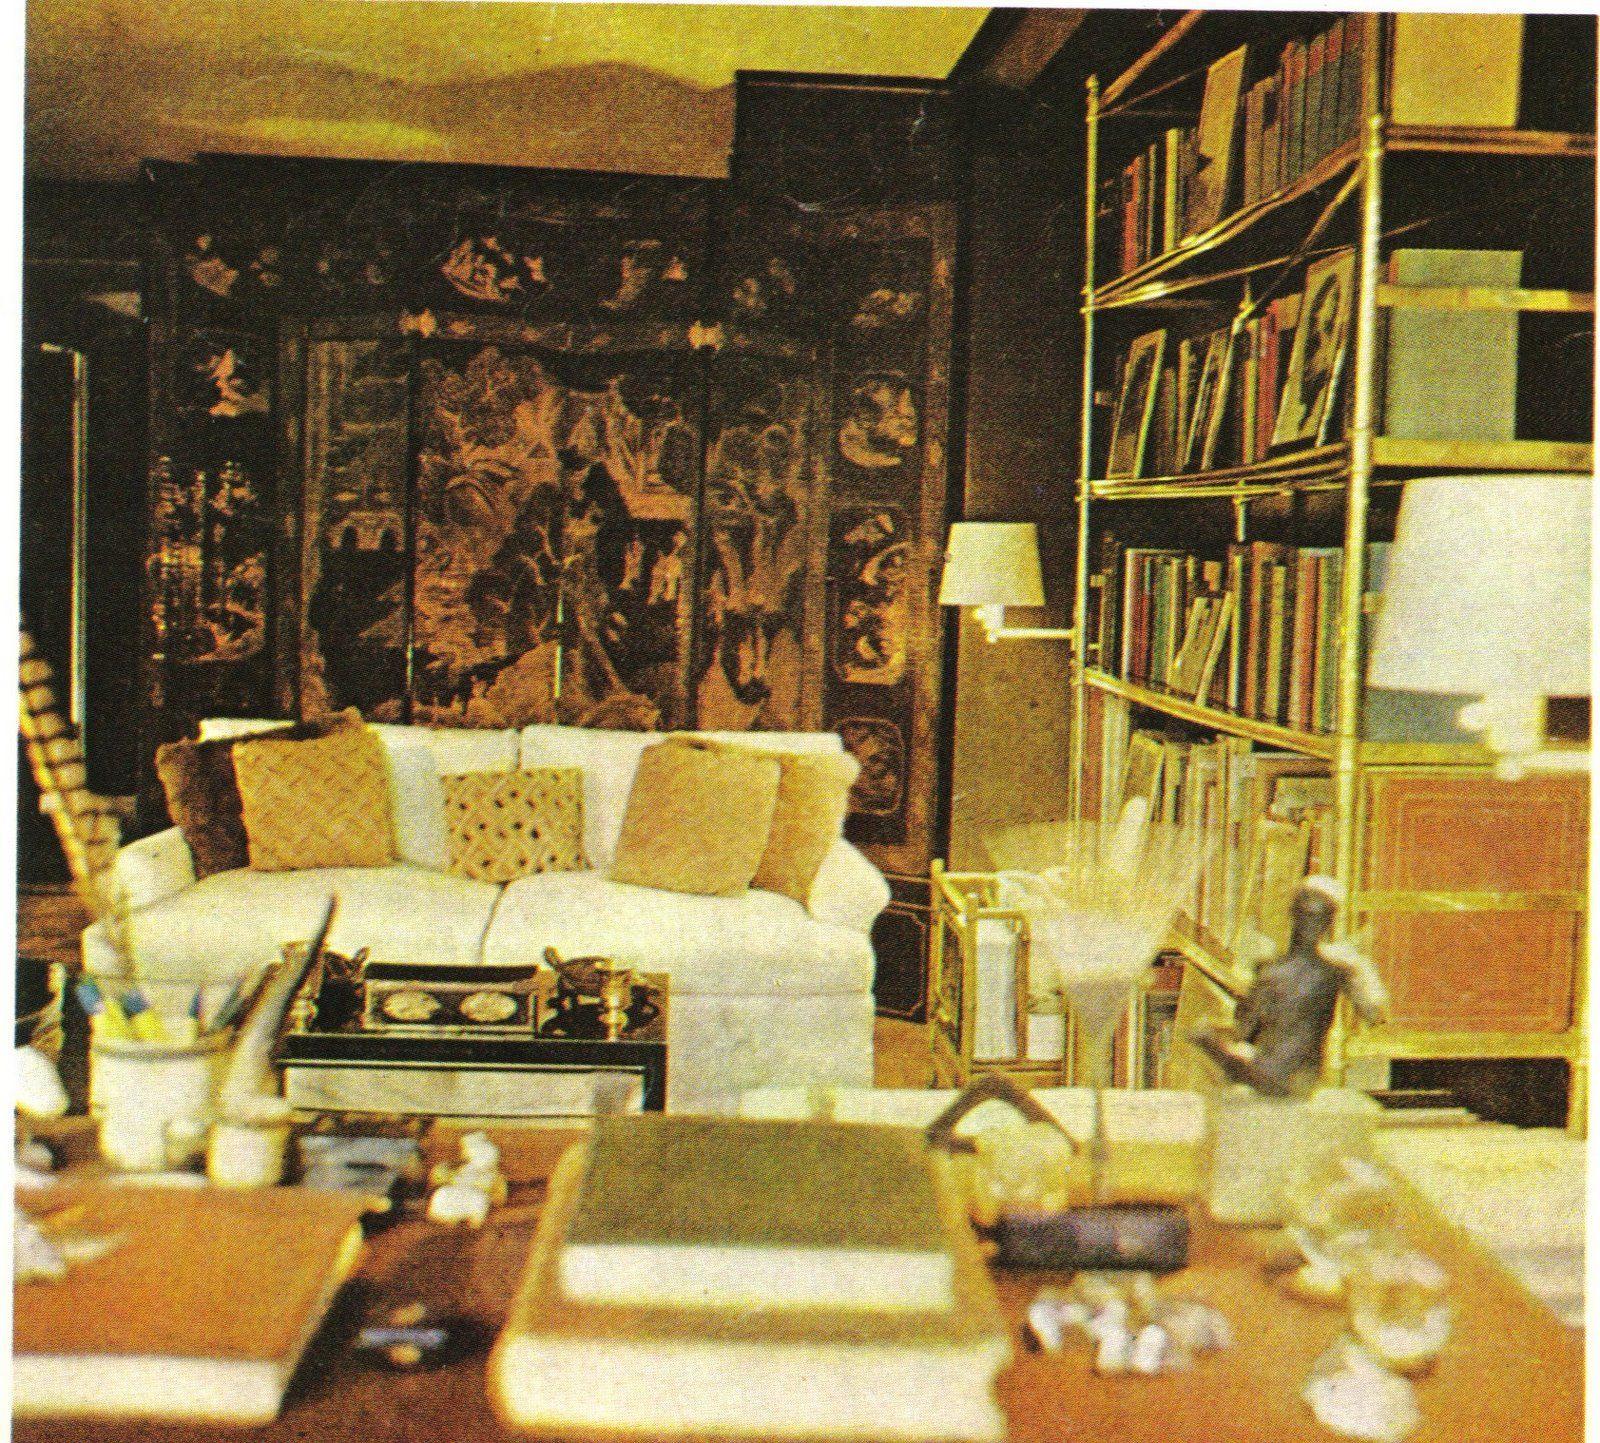 Manhattan New York Studio Apartments: Billy Baldwin's Studio Apartment On East 61st Street In